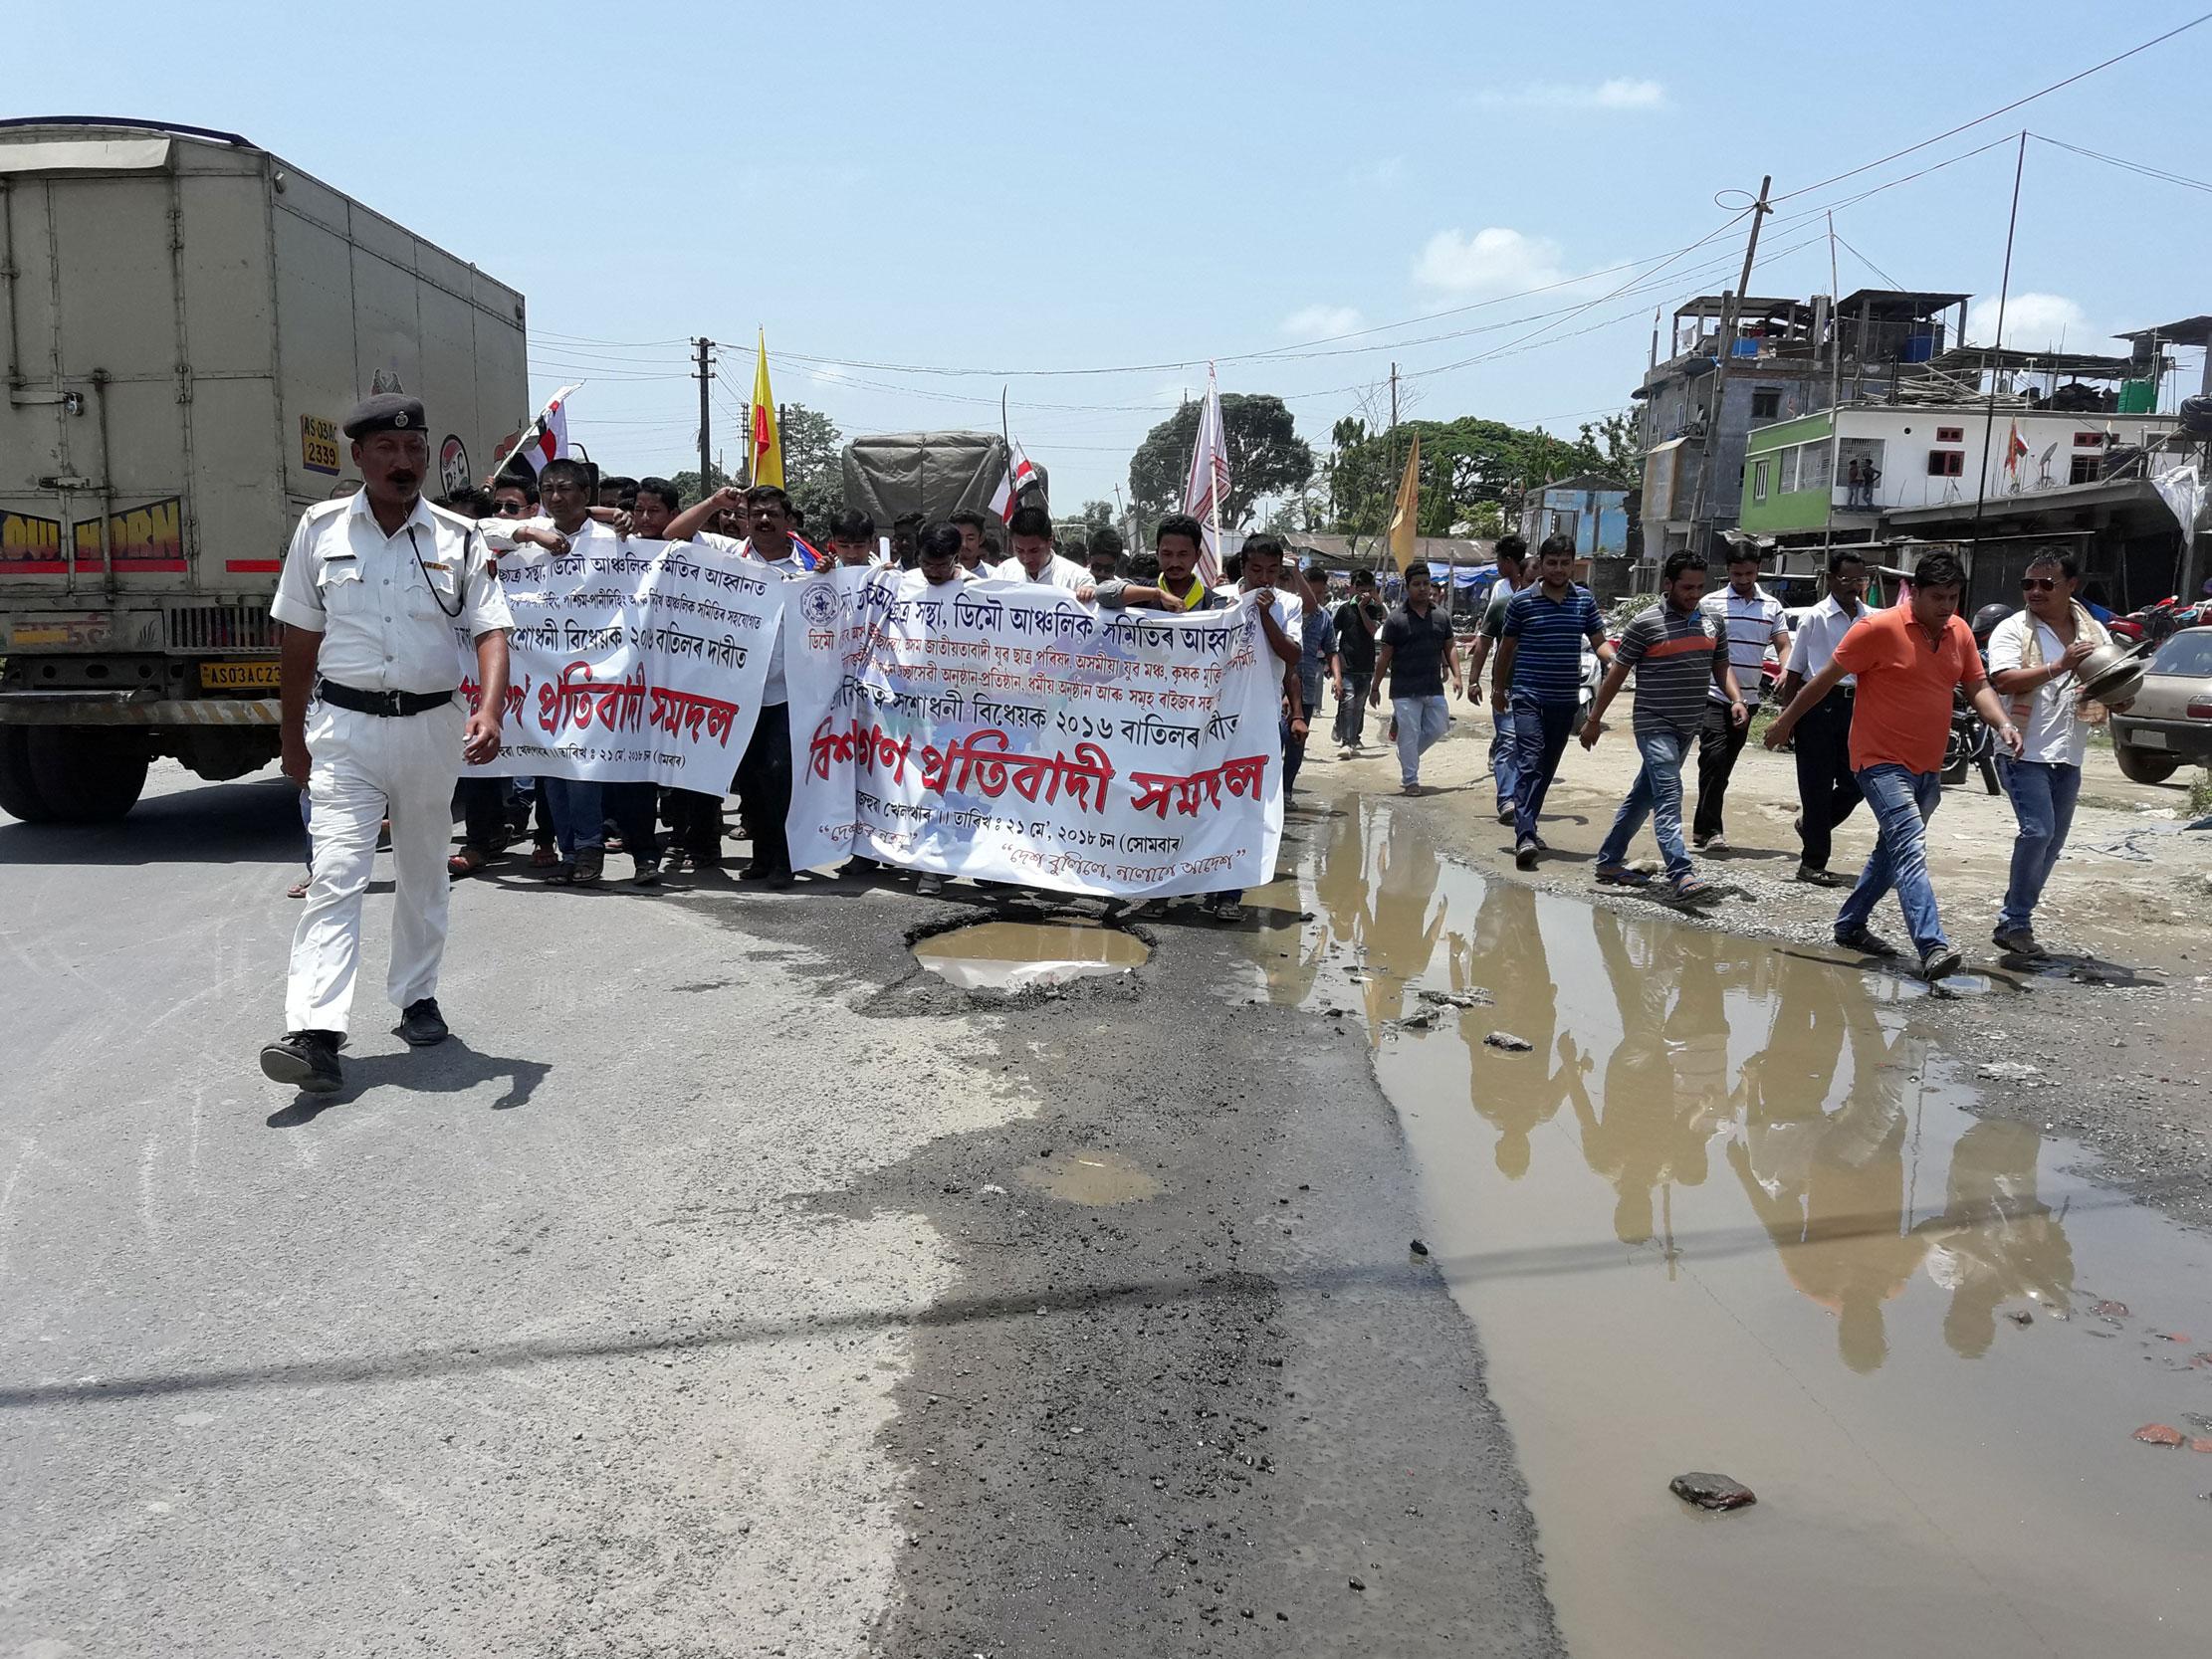 Protest rally against Citizenship (Amendment) Bill